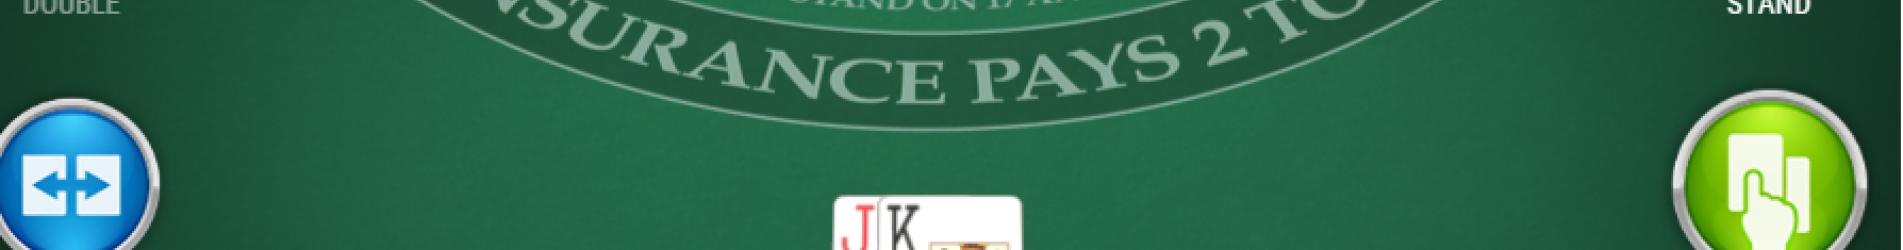 بلاك جاك اون لاين مجانا Free Online Blackjack